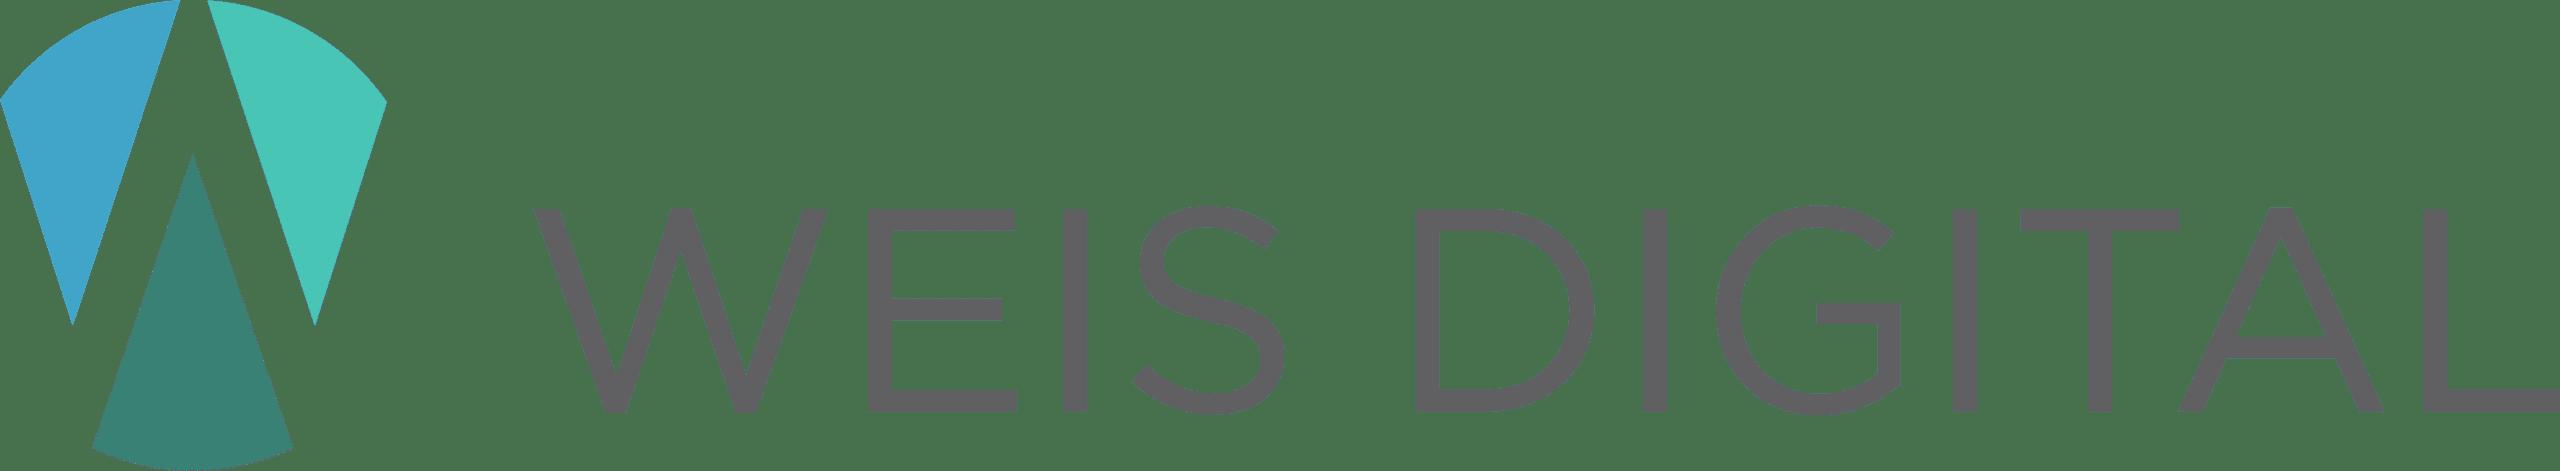 Logo Weis Digital - Webdesign Viersen